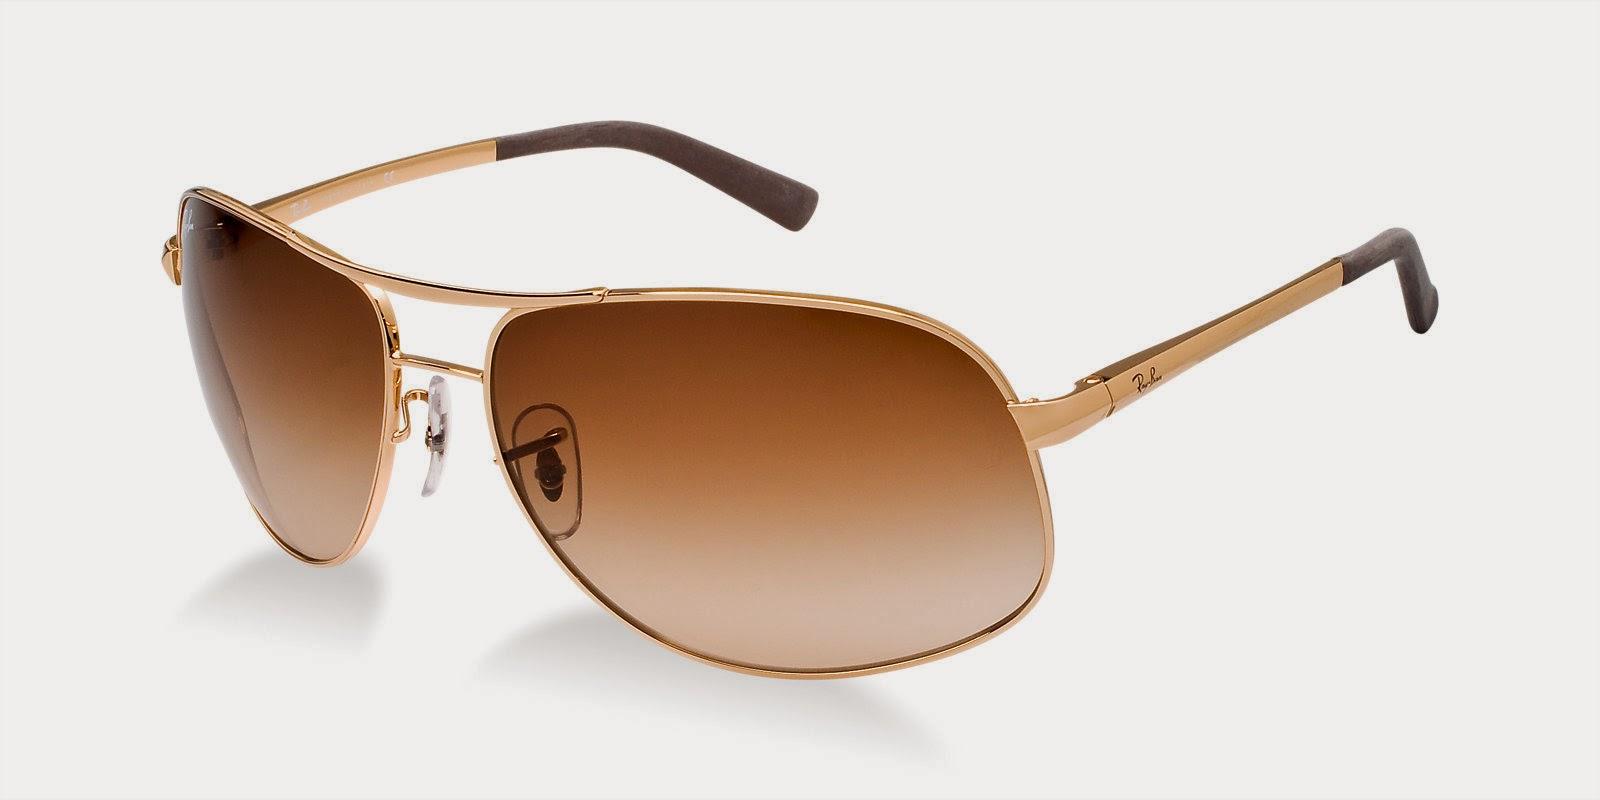 gafas de sol ray ban baratas aviator